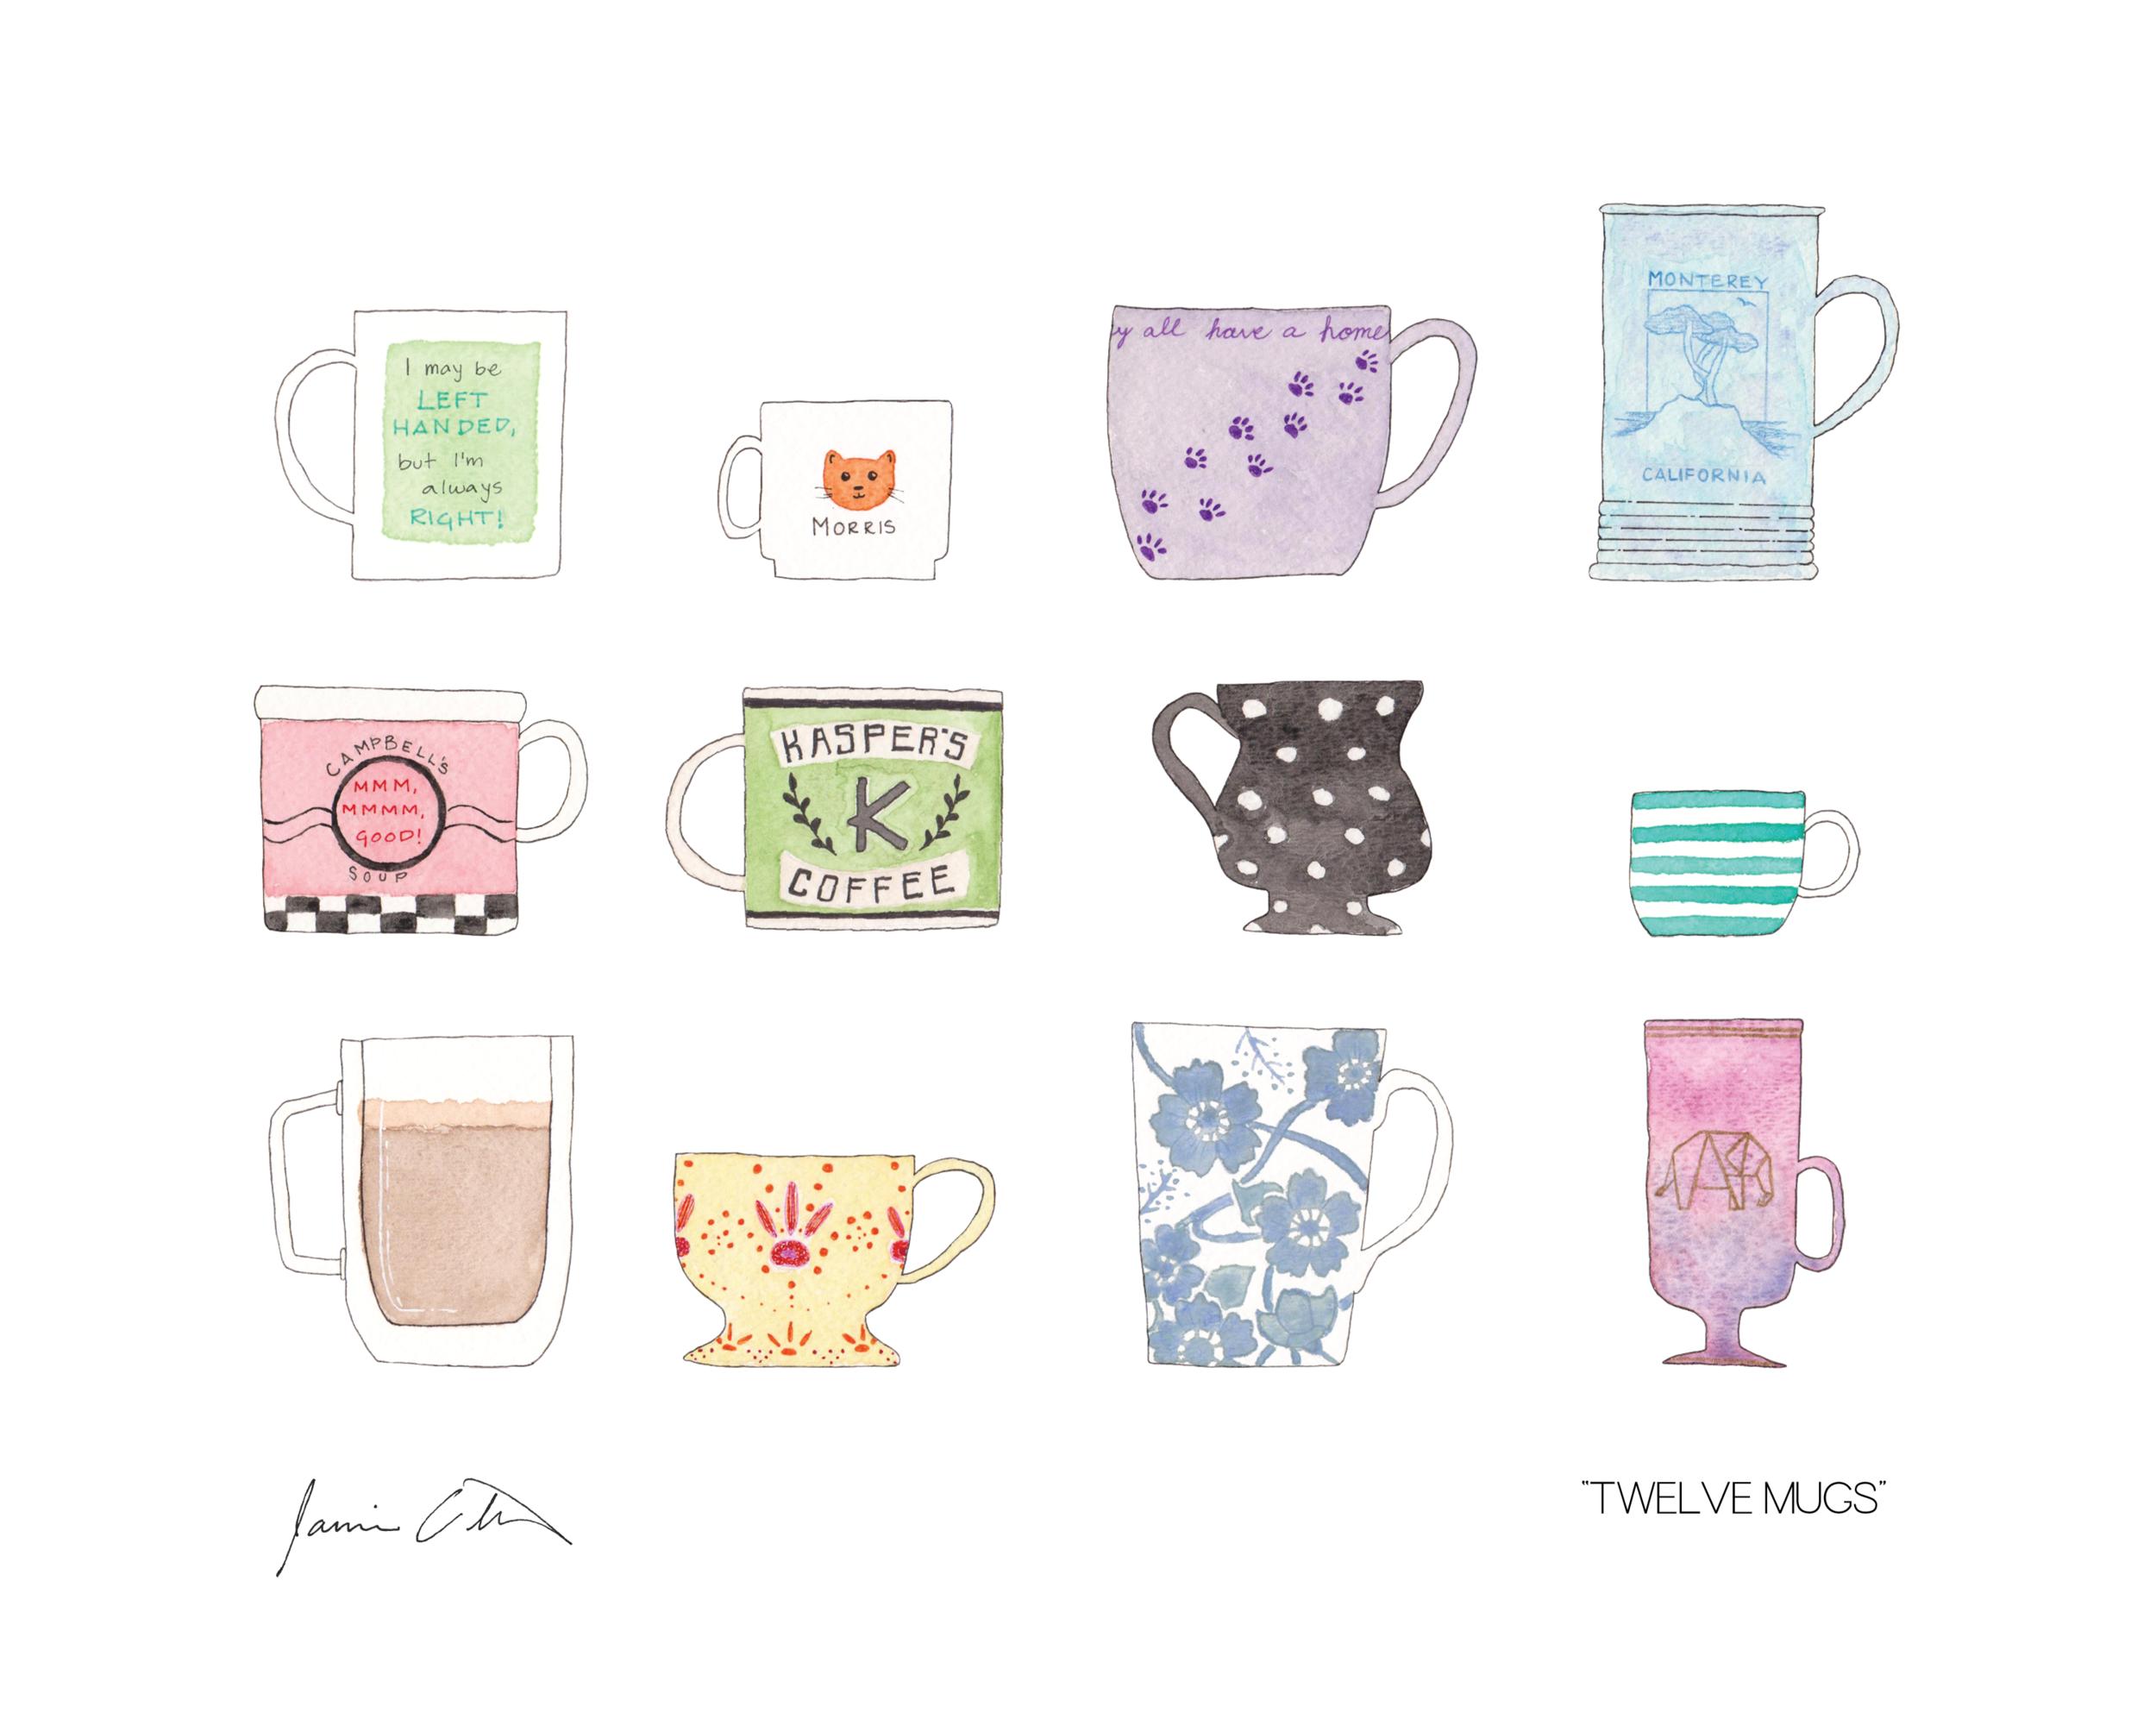 Twelve Mugs